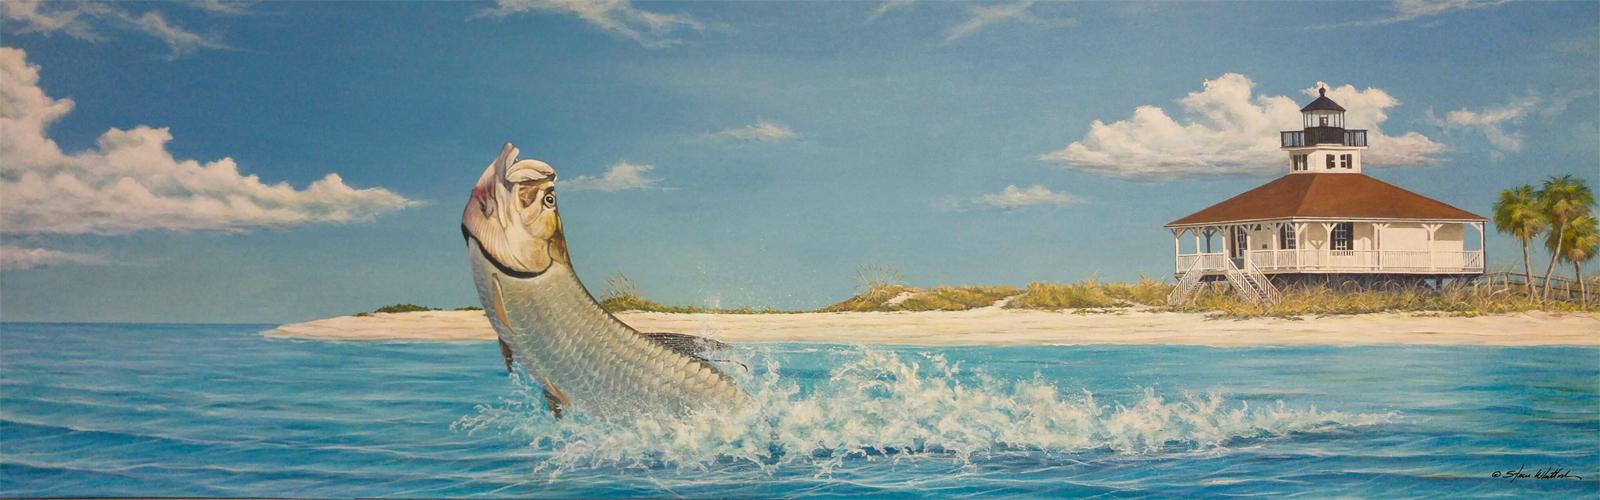 Boca Grande Florida tarpon jumping art by Steve Whitlock